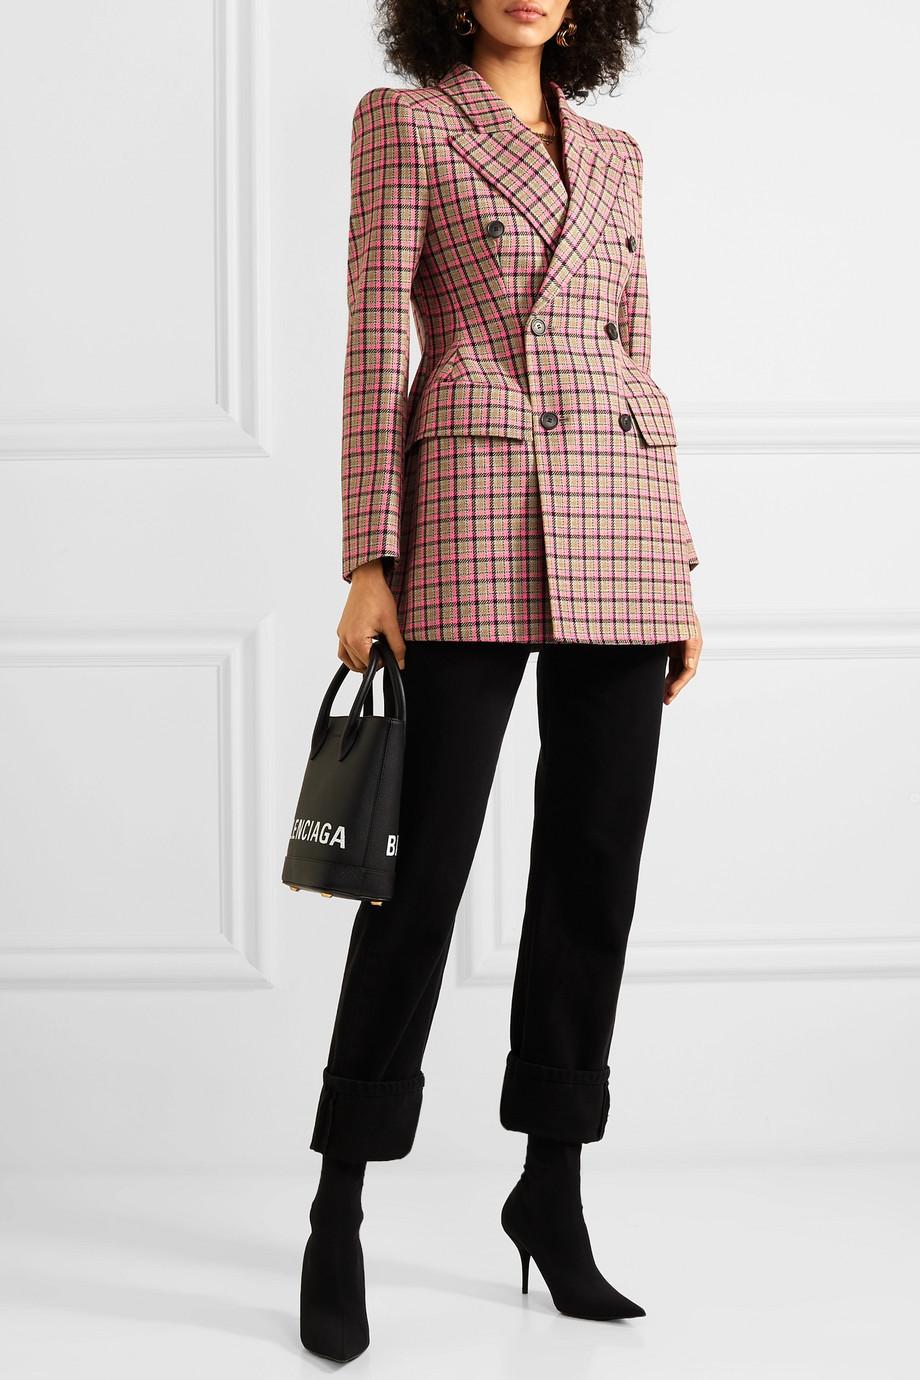 Balenciaga Hourglass checked wool blazer with internal shoulder pads $2,990